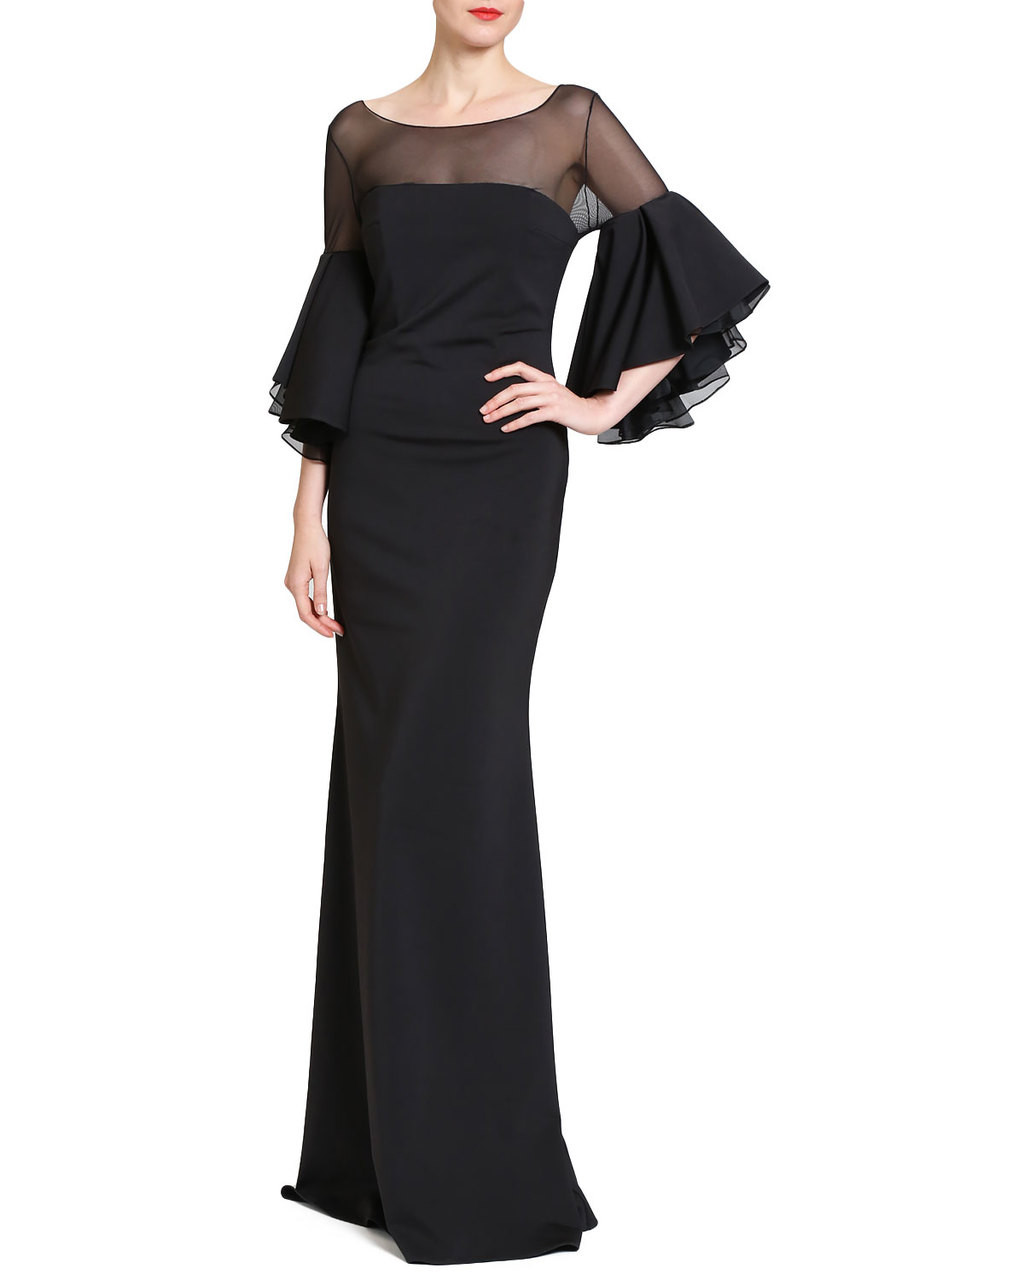 85ef4e6ed21d7 Ruffle Bell Sleeve Evening Gown by Badgley Mischka